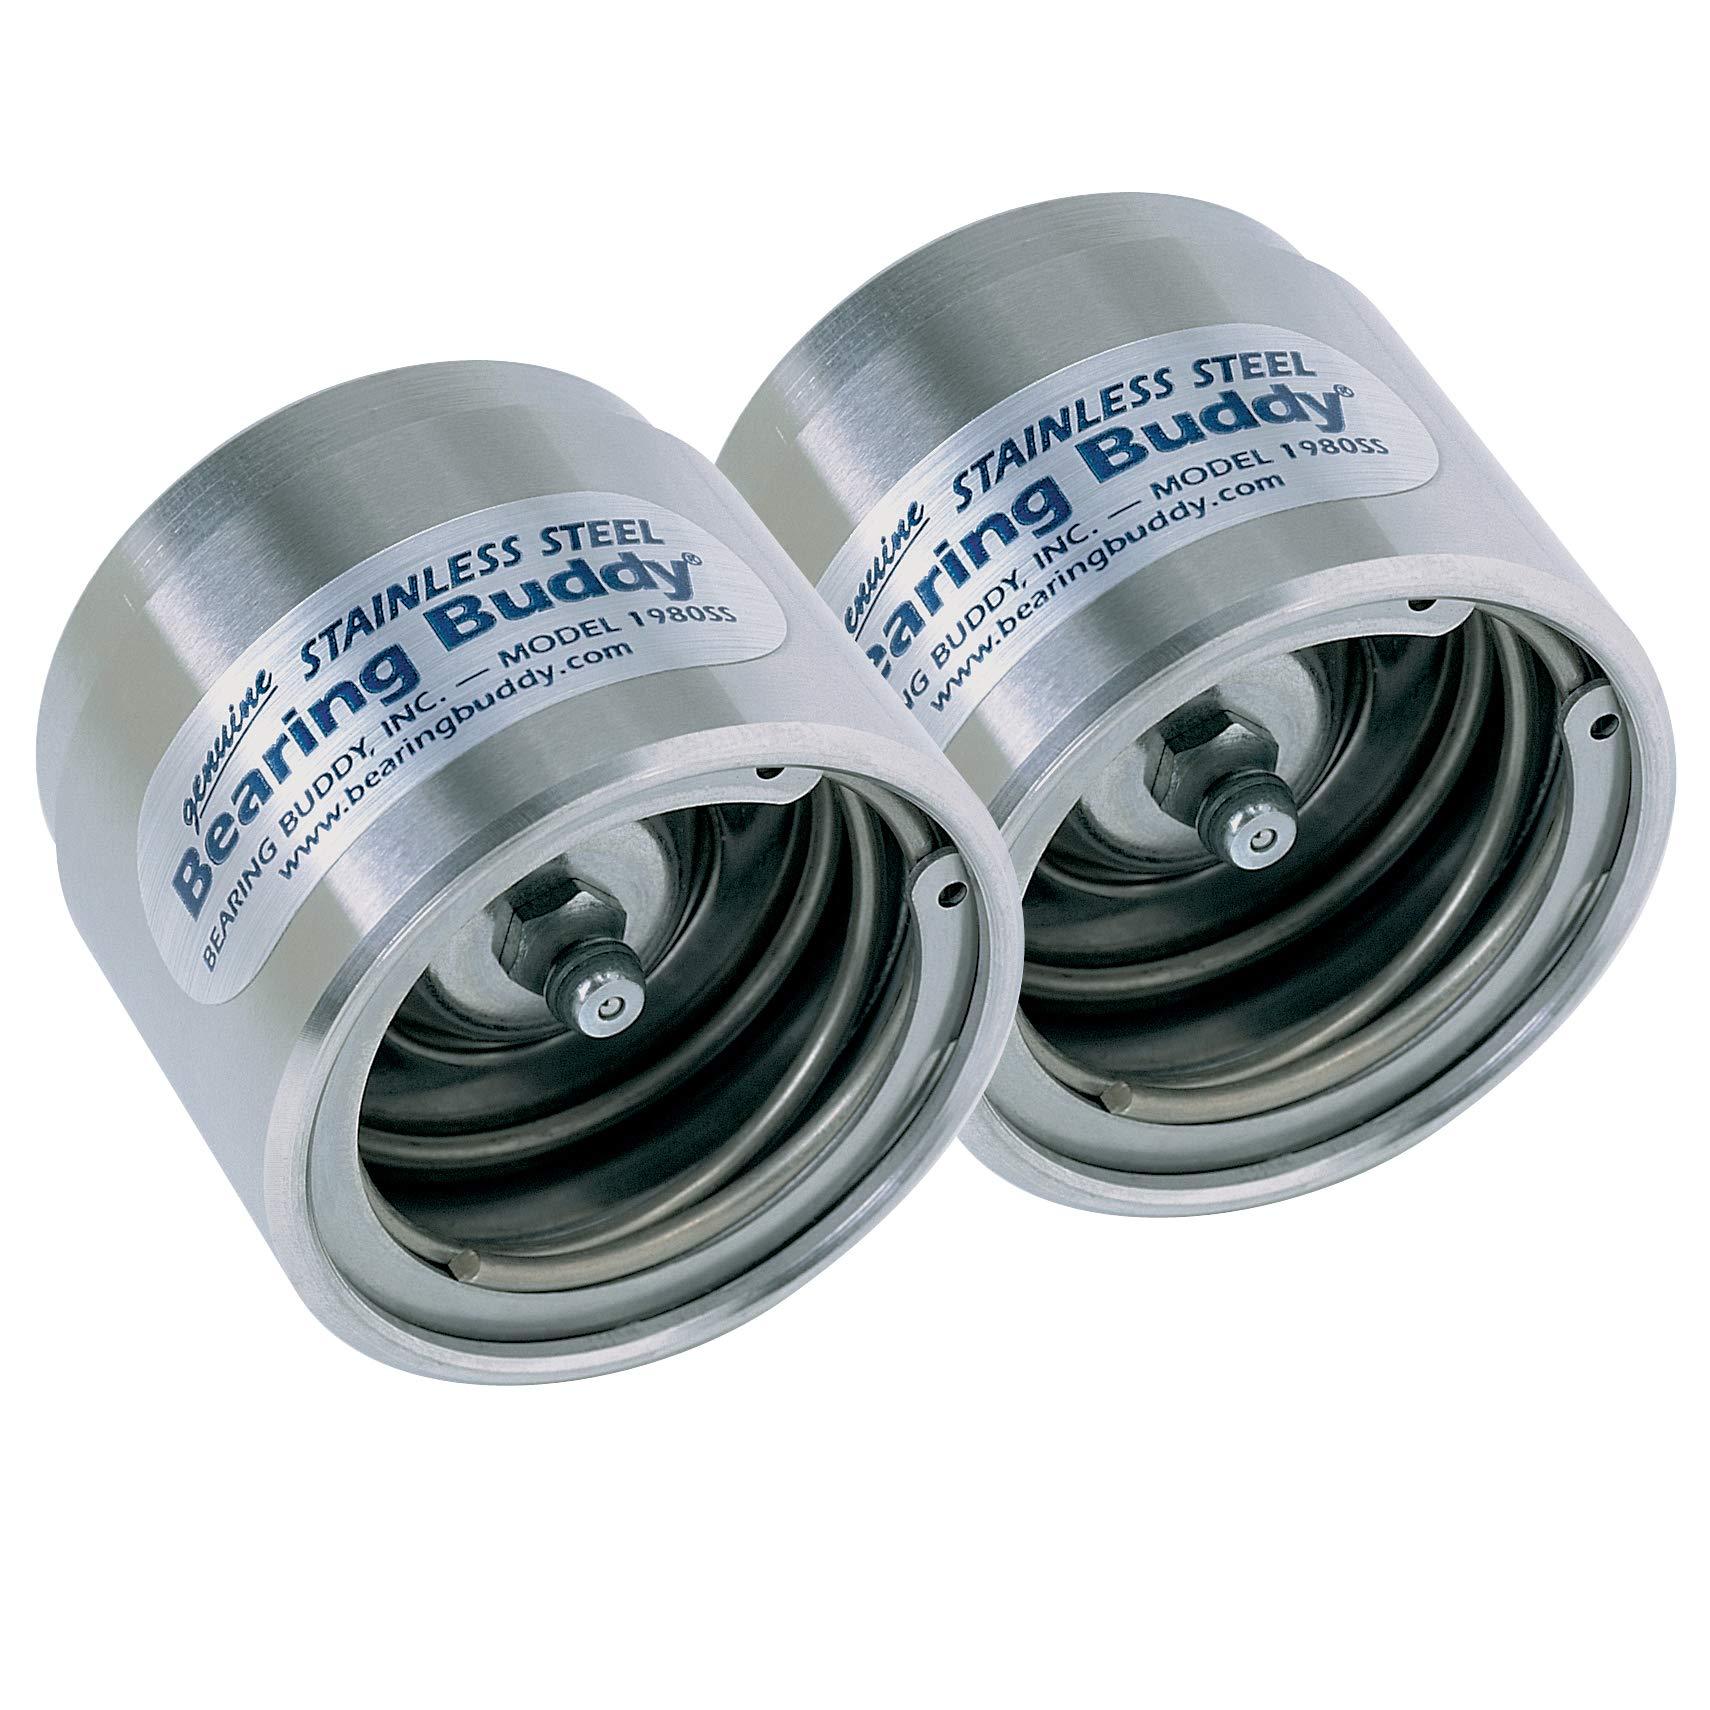 Bearing Buddy (43104) Stainless Steel Bearing Protectors (pair) - 2.328'' Diameter by Bearing Buddy